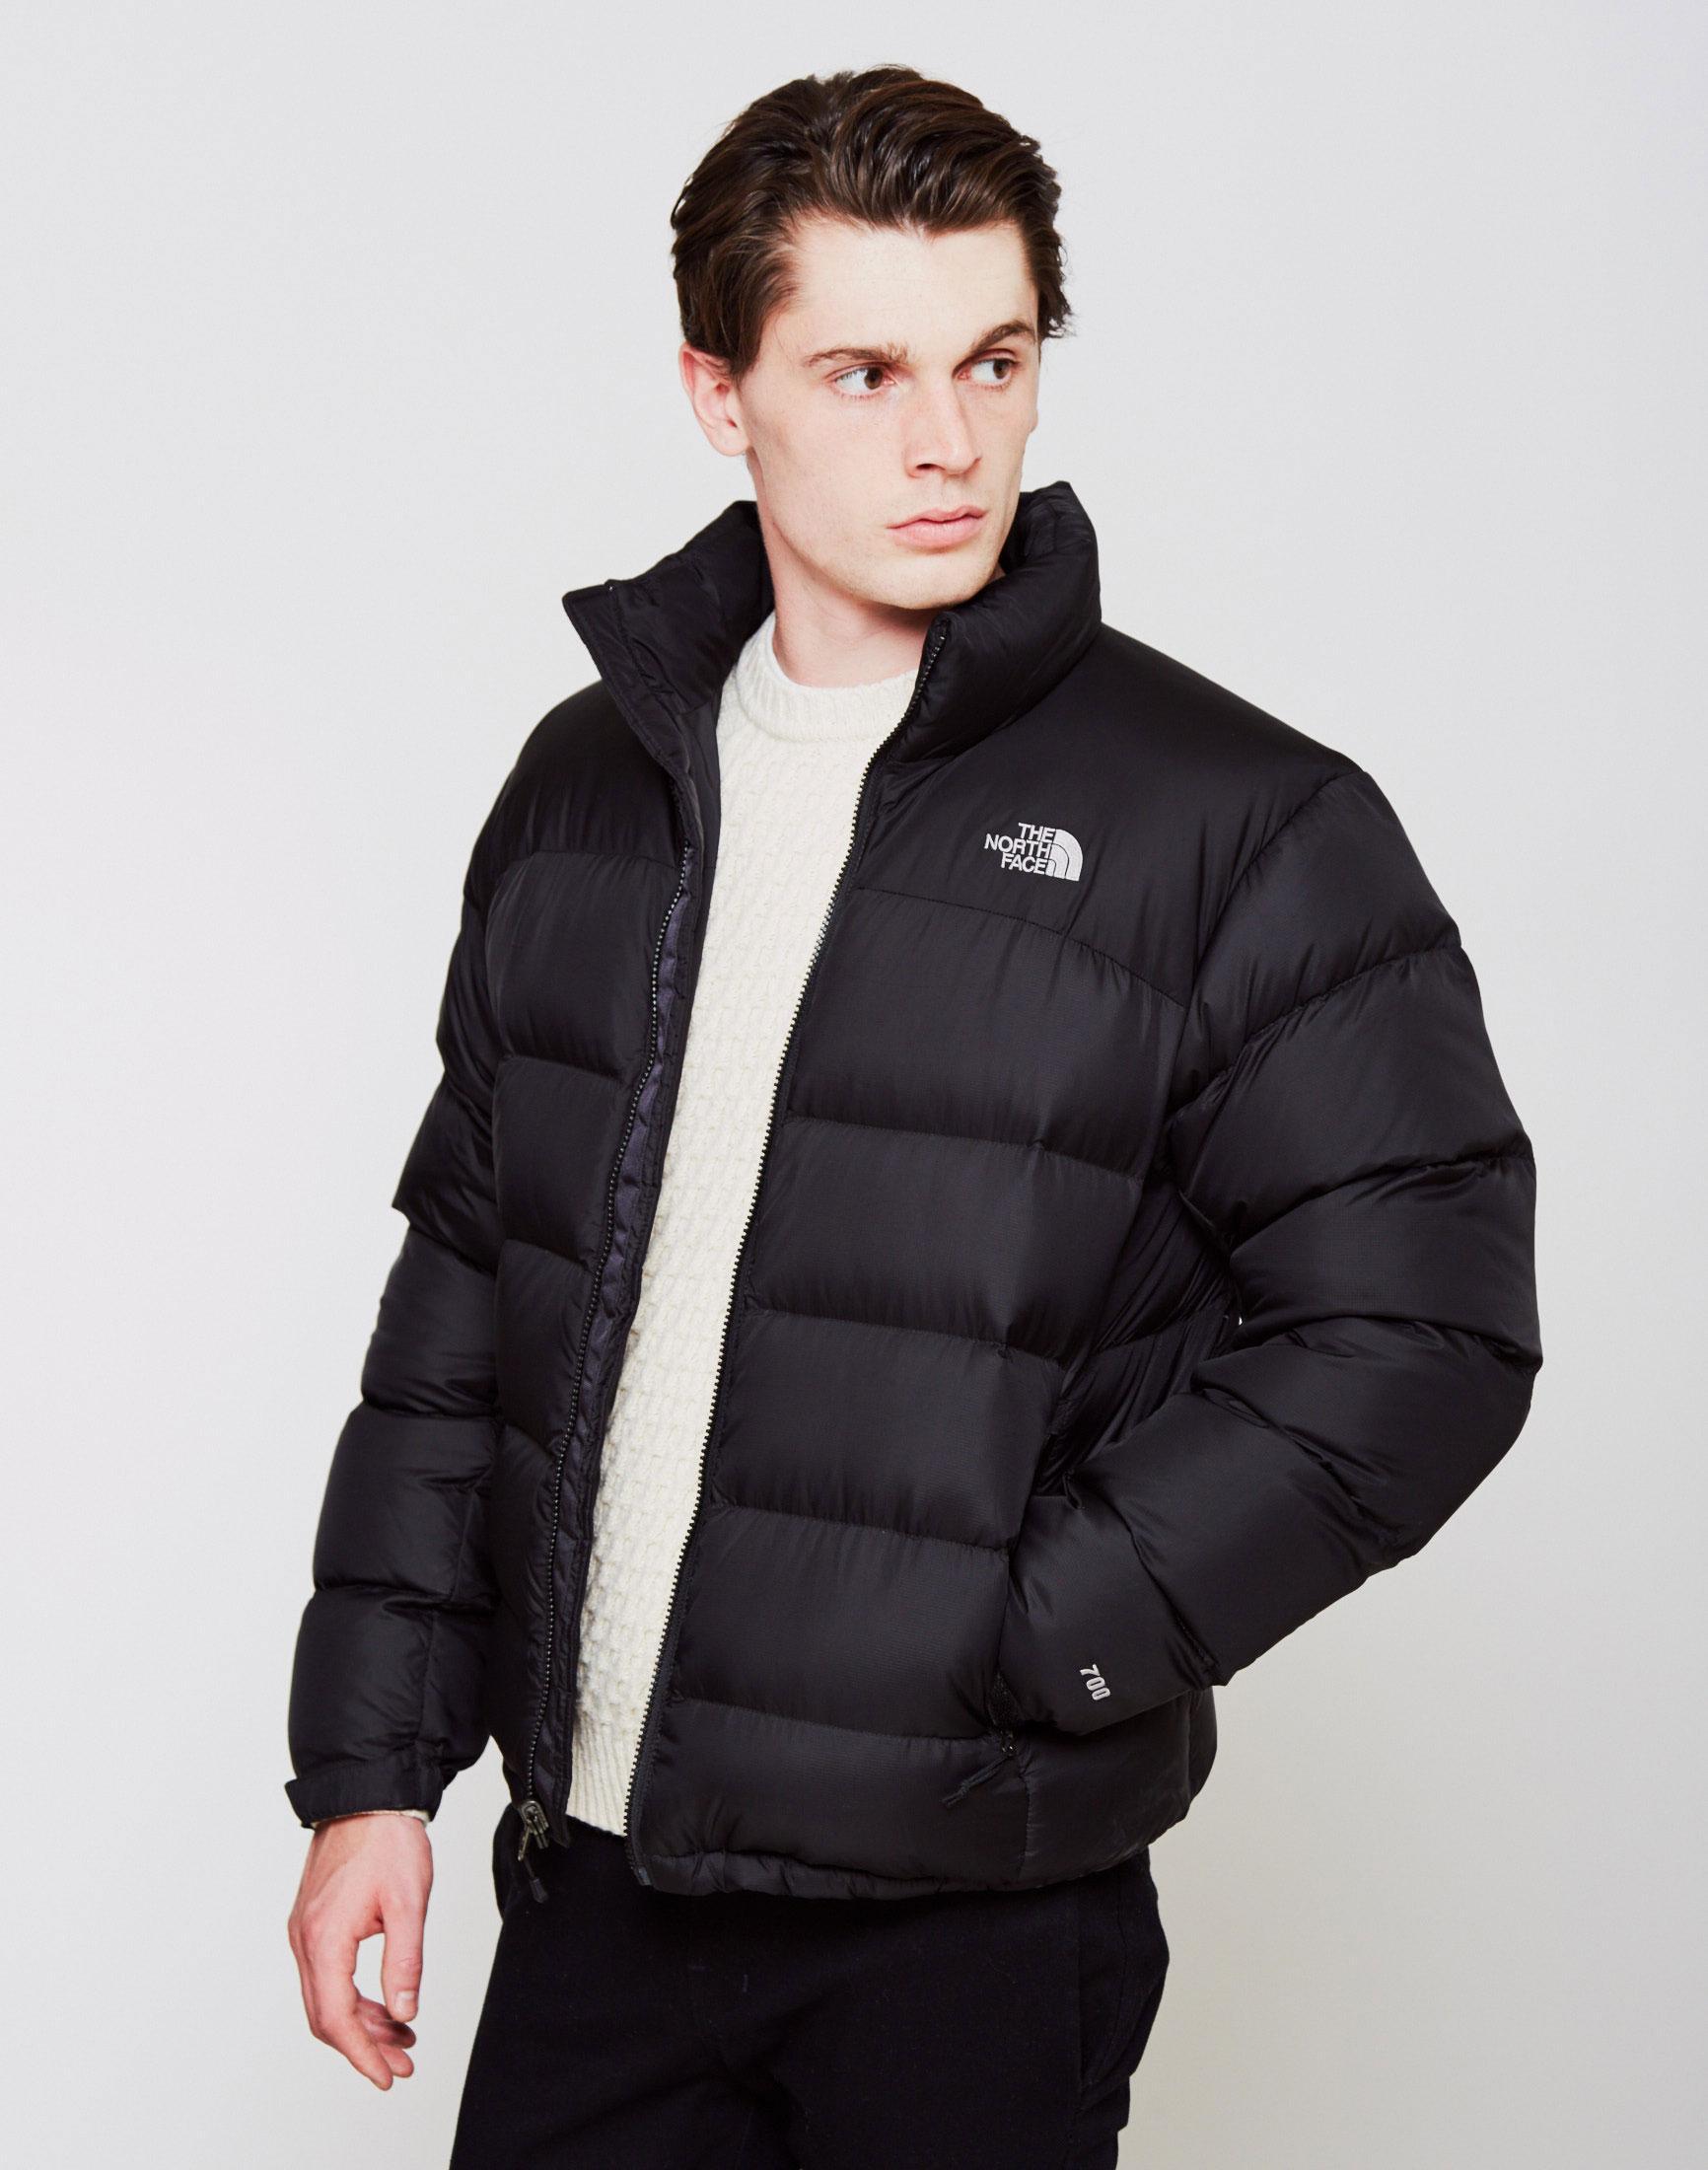 cc364f927 promo code for mens north face nuptse vest sale ad a8af3 373f6